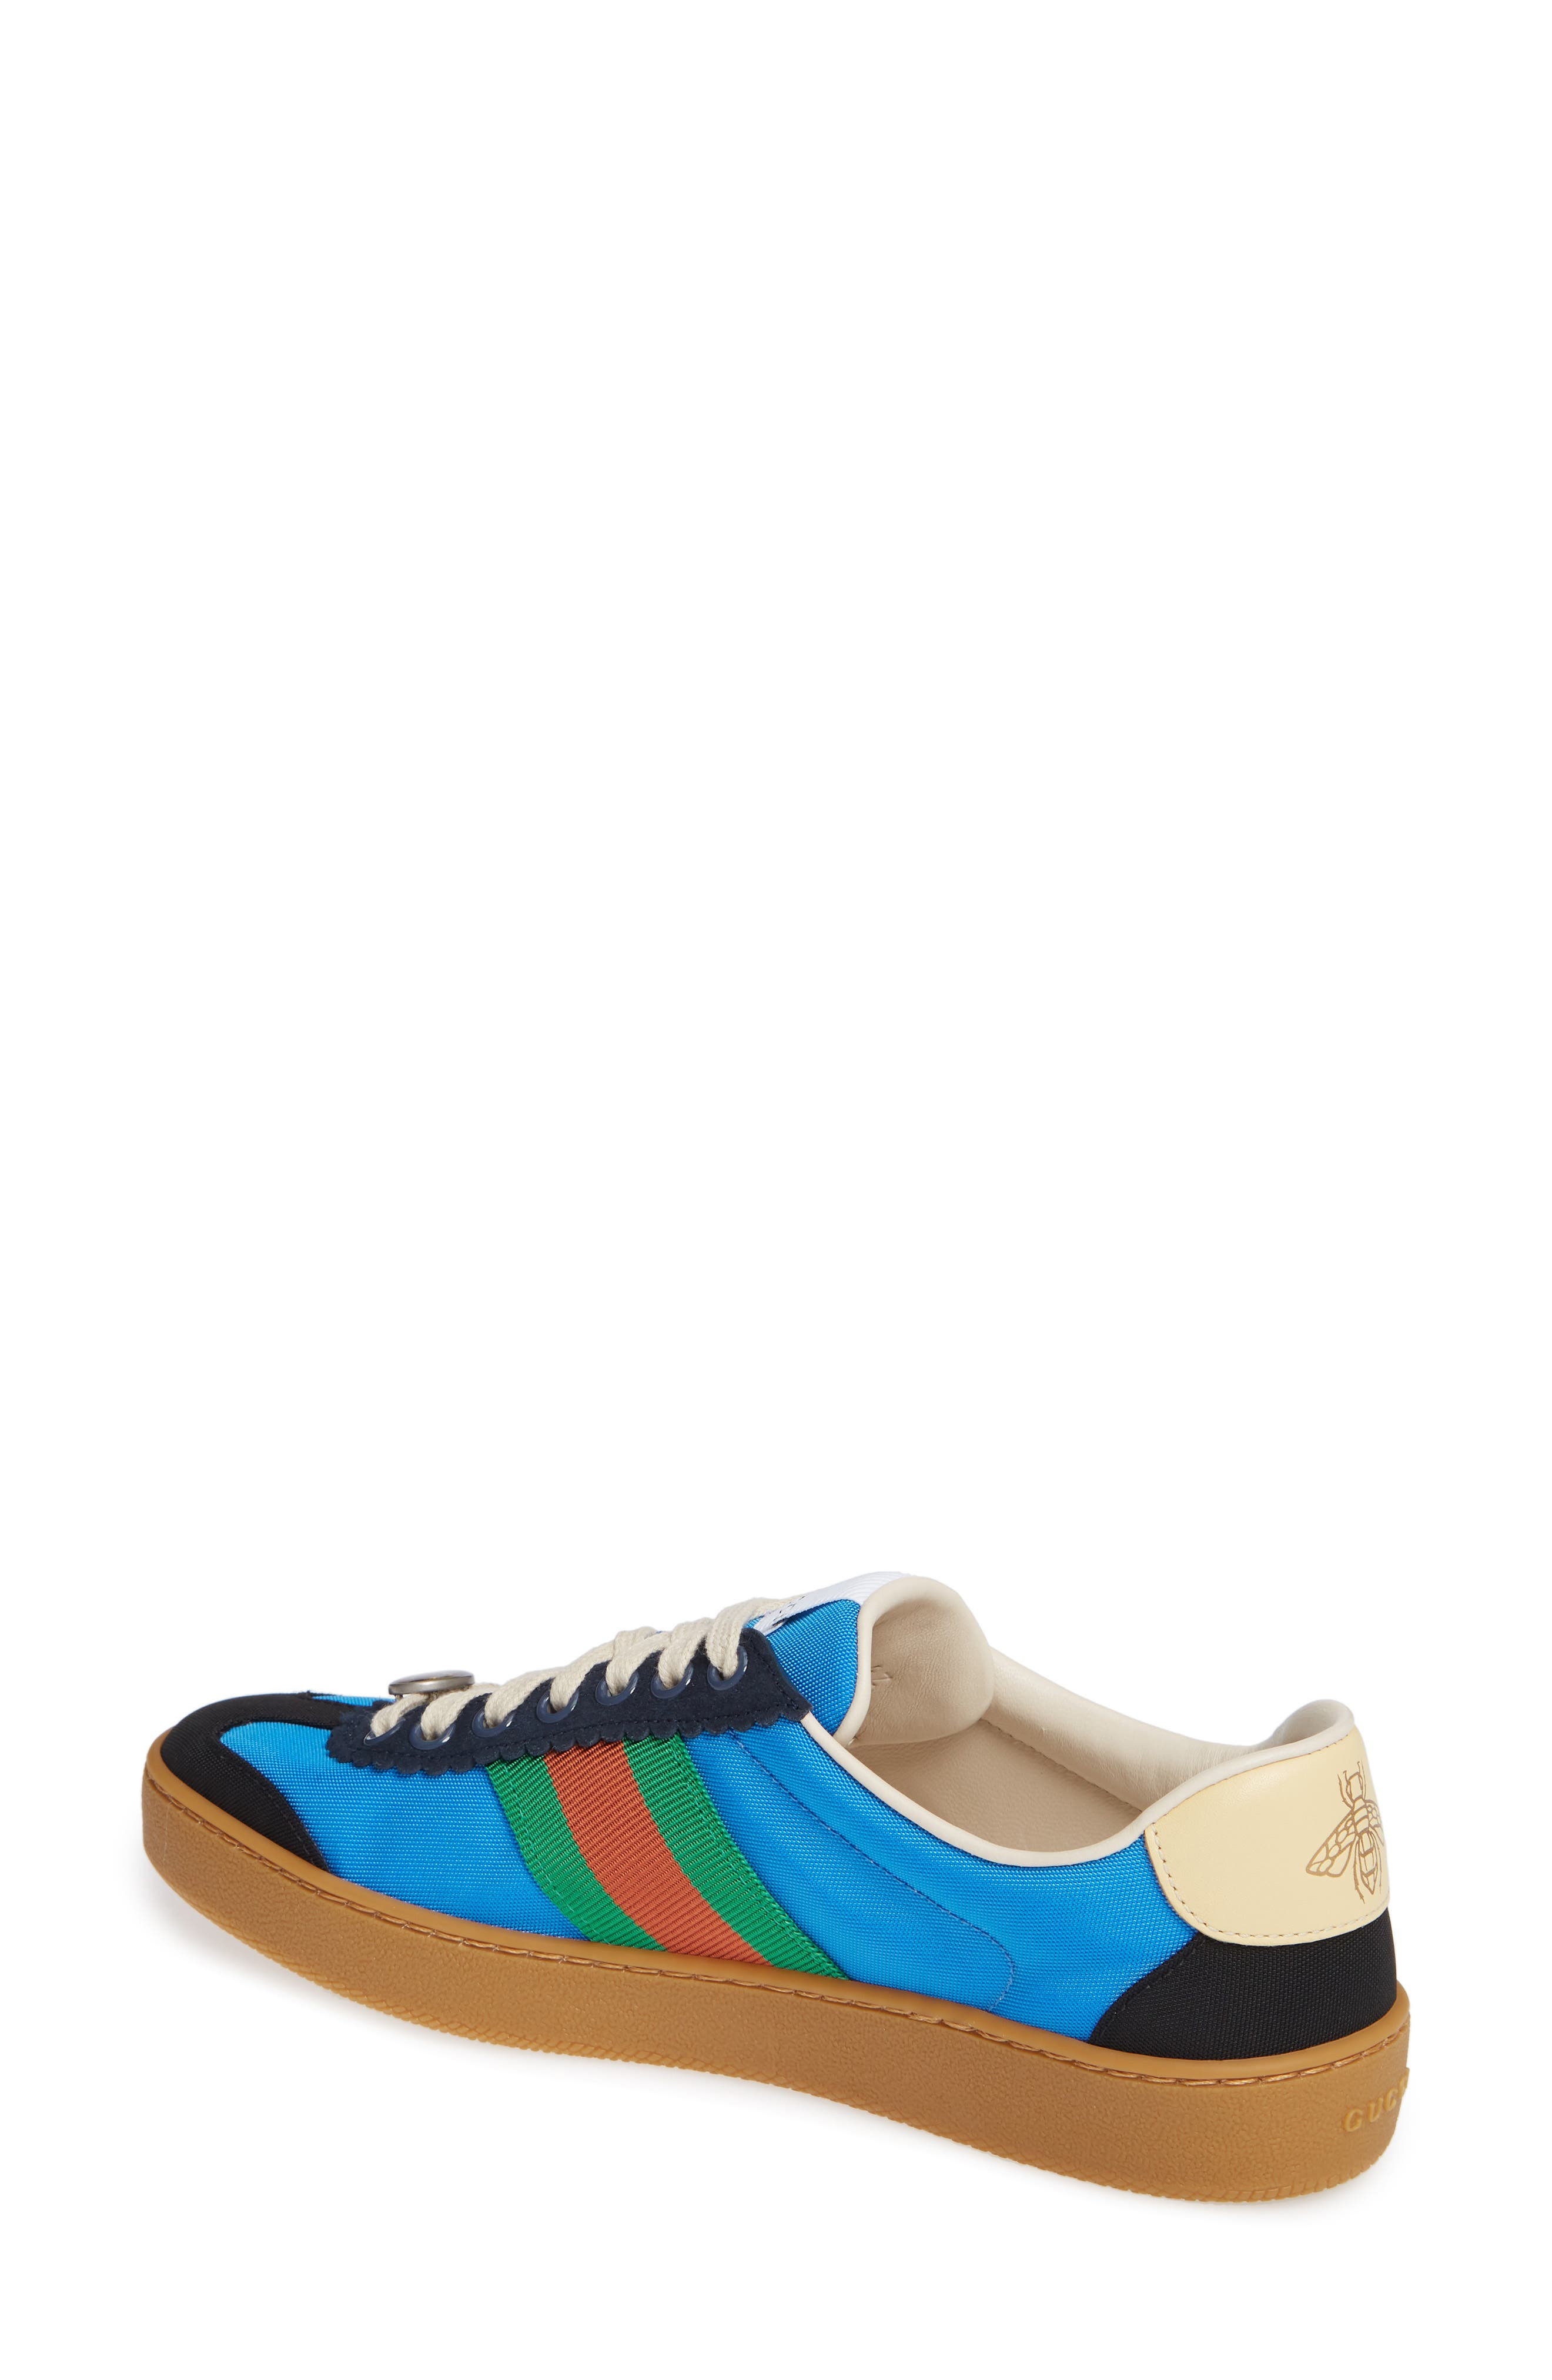 GUCCI, G74 Low Top Sneaker, Alternate thumbnail 2, color, 400